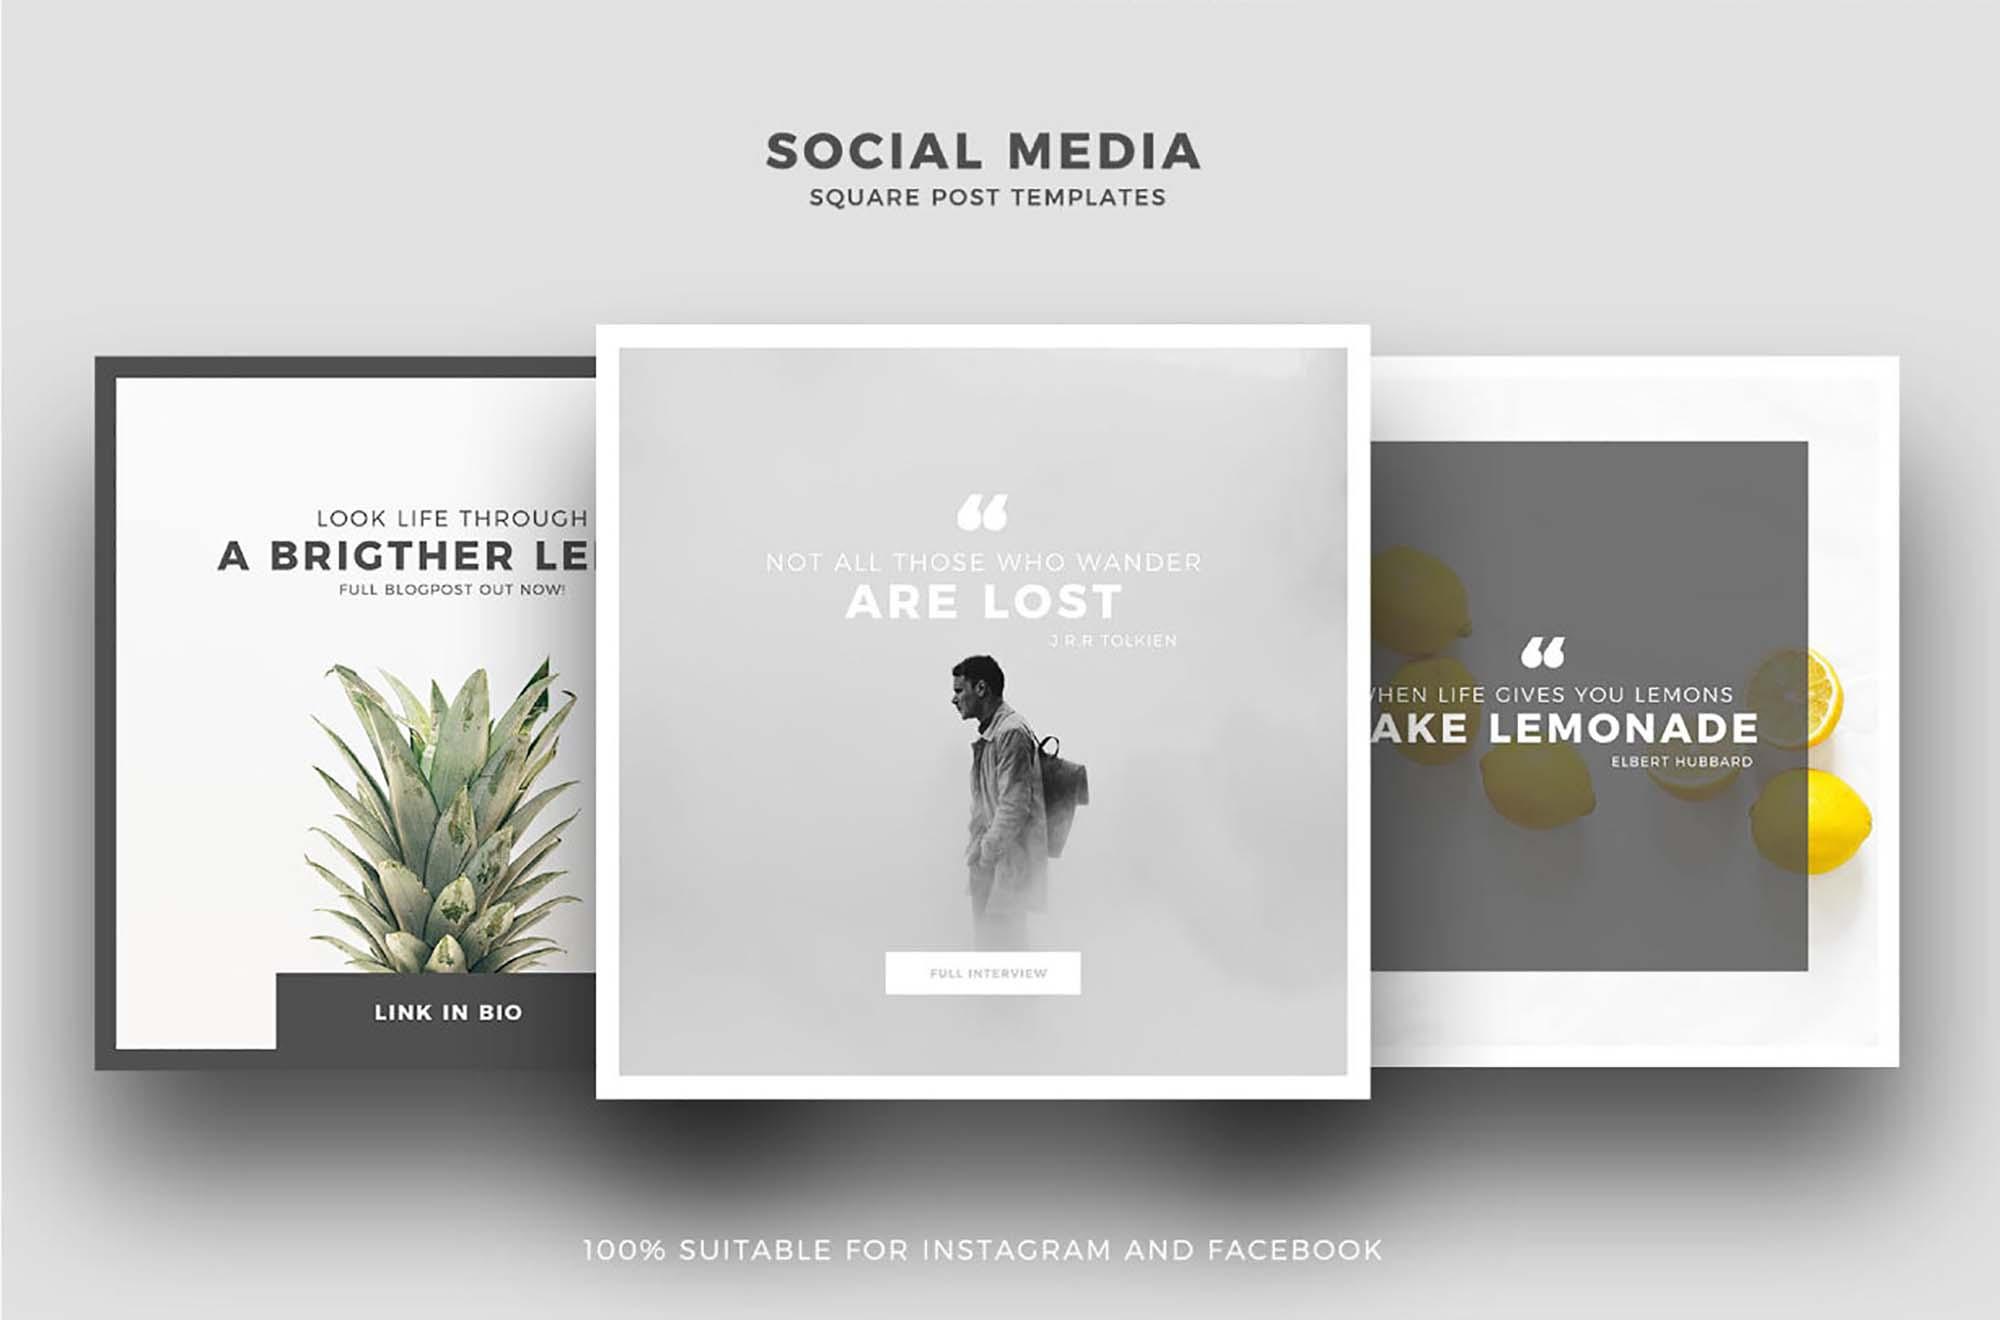 Minimis Instagram Social Media Templates 2